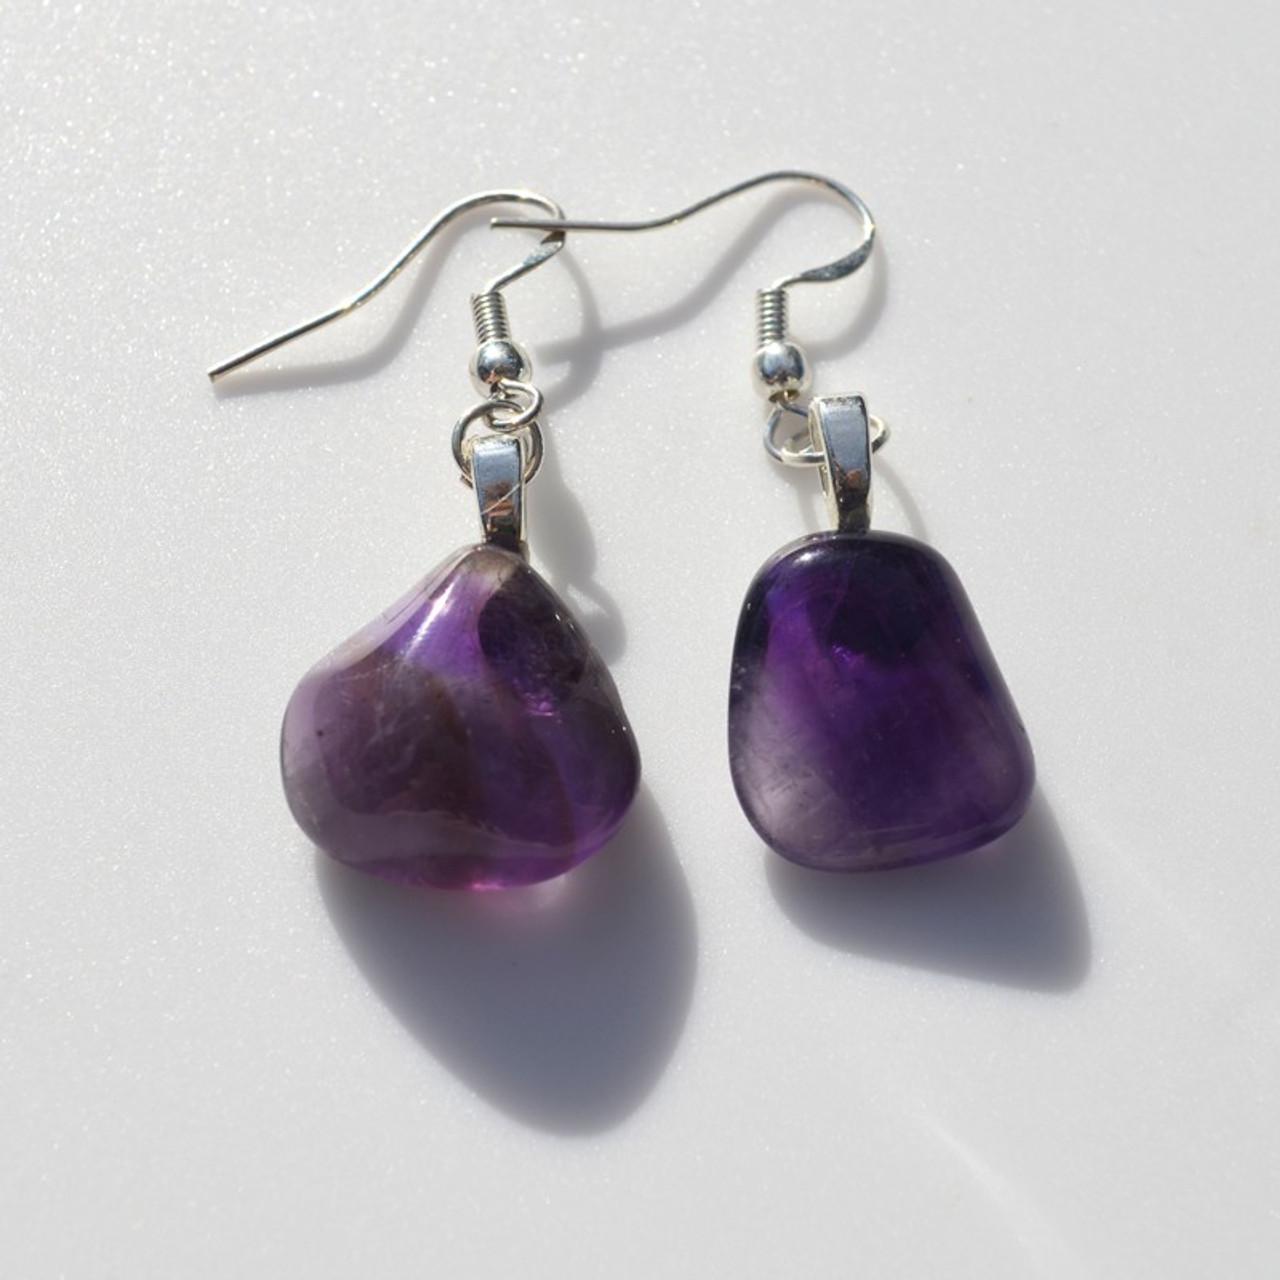 Tumbled Amethyst Earrings